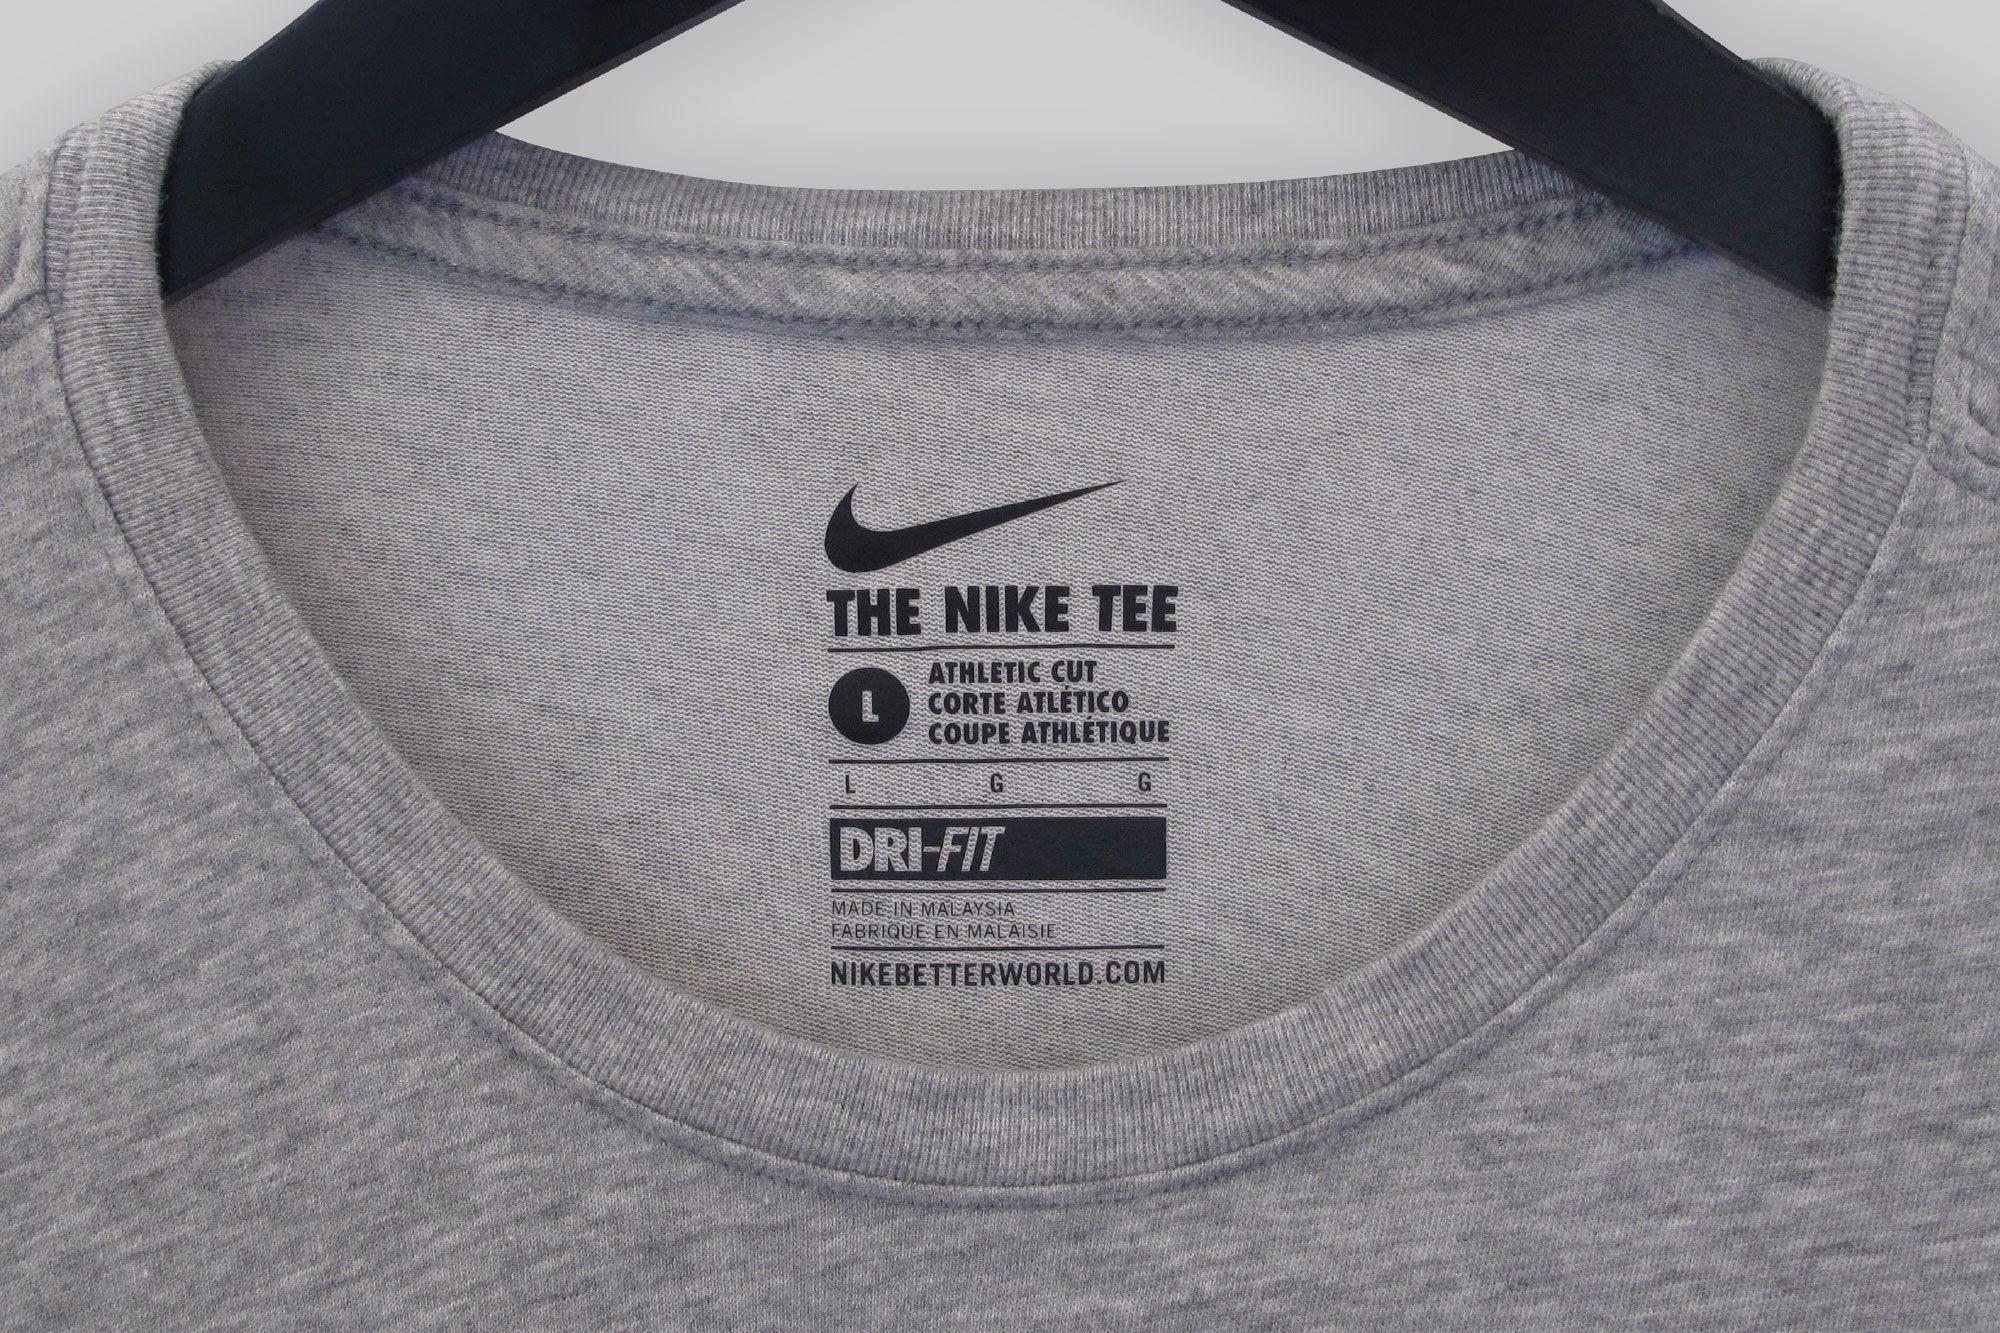 Download Nike Global Label System Clothing Labels Design Clothing Care Label Printing Labels